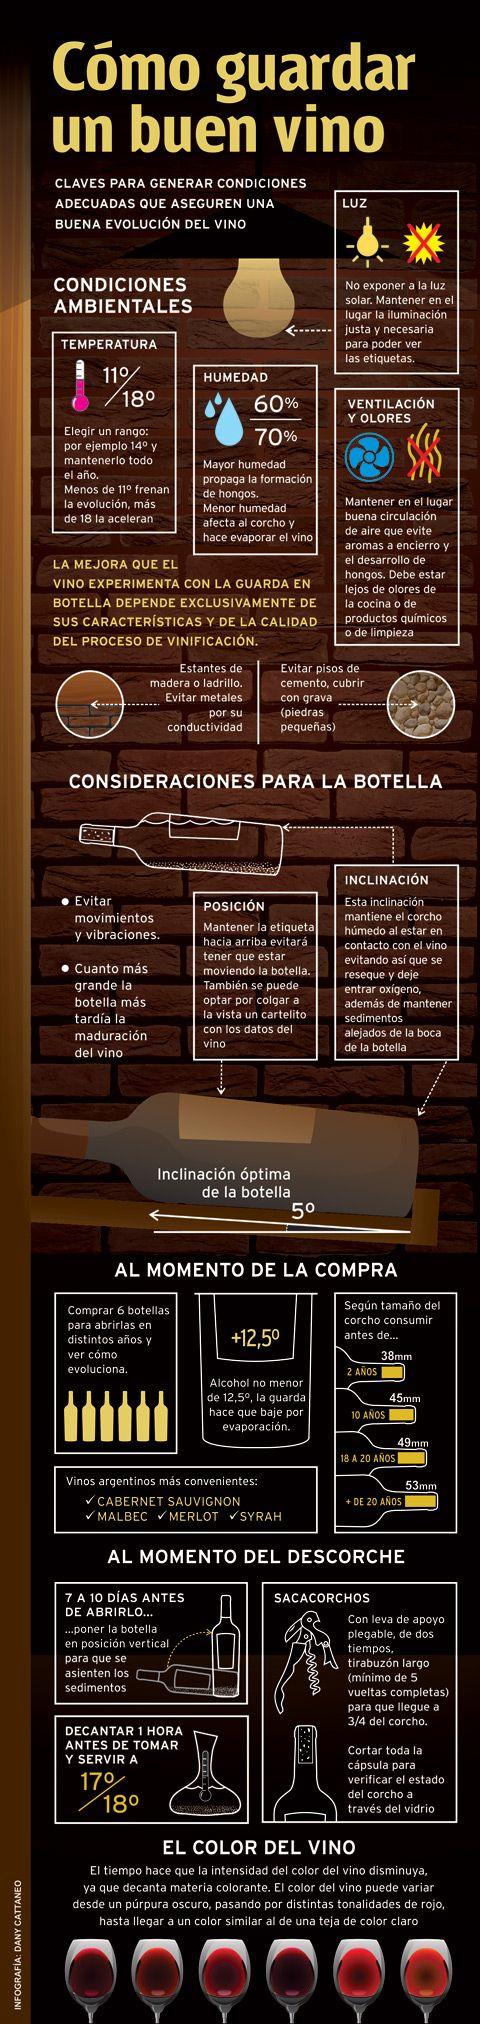 460 Ideas De Bodegas Bodegas Bodegas De Vino Cava Vino